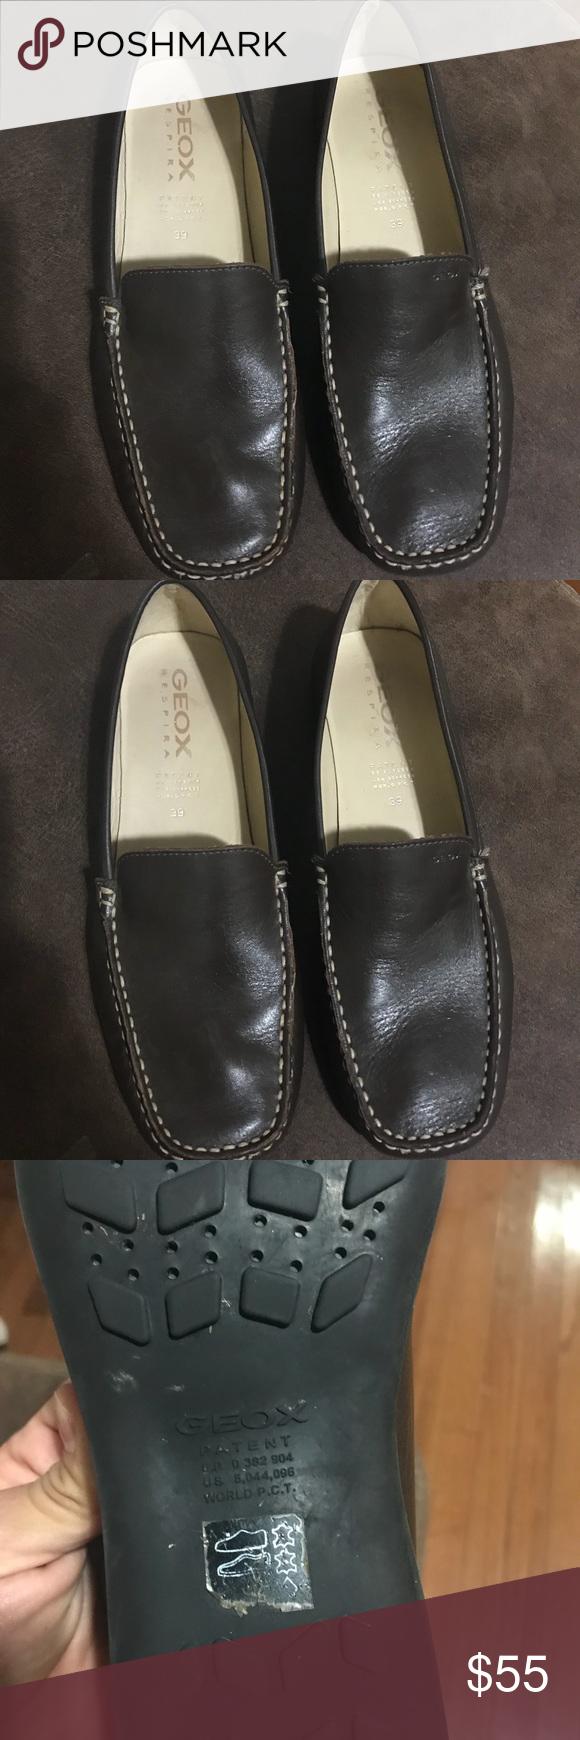 ajuste clásico como comprar atesorar como una mercancía rara GEOX respira made in Brasil shoes Great condition and cute style ...